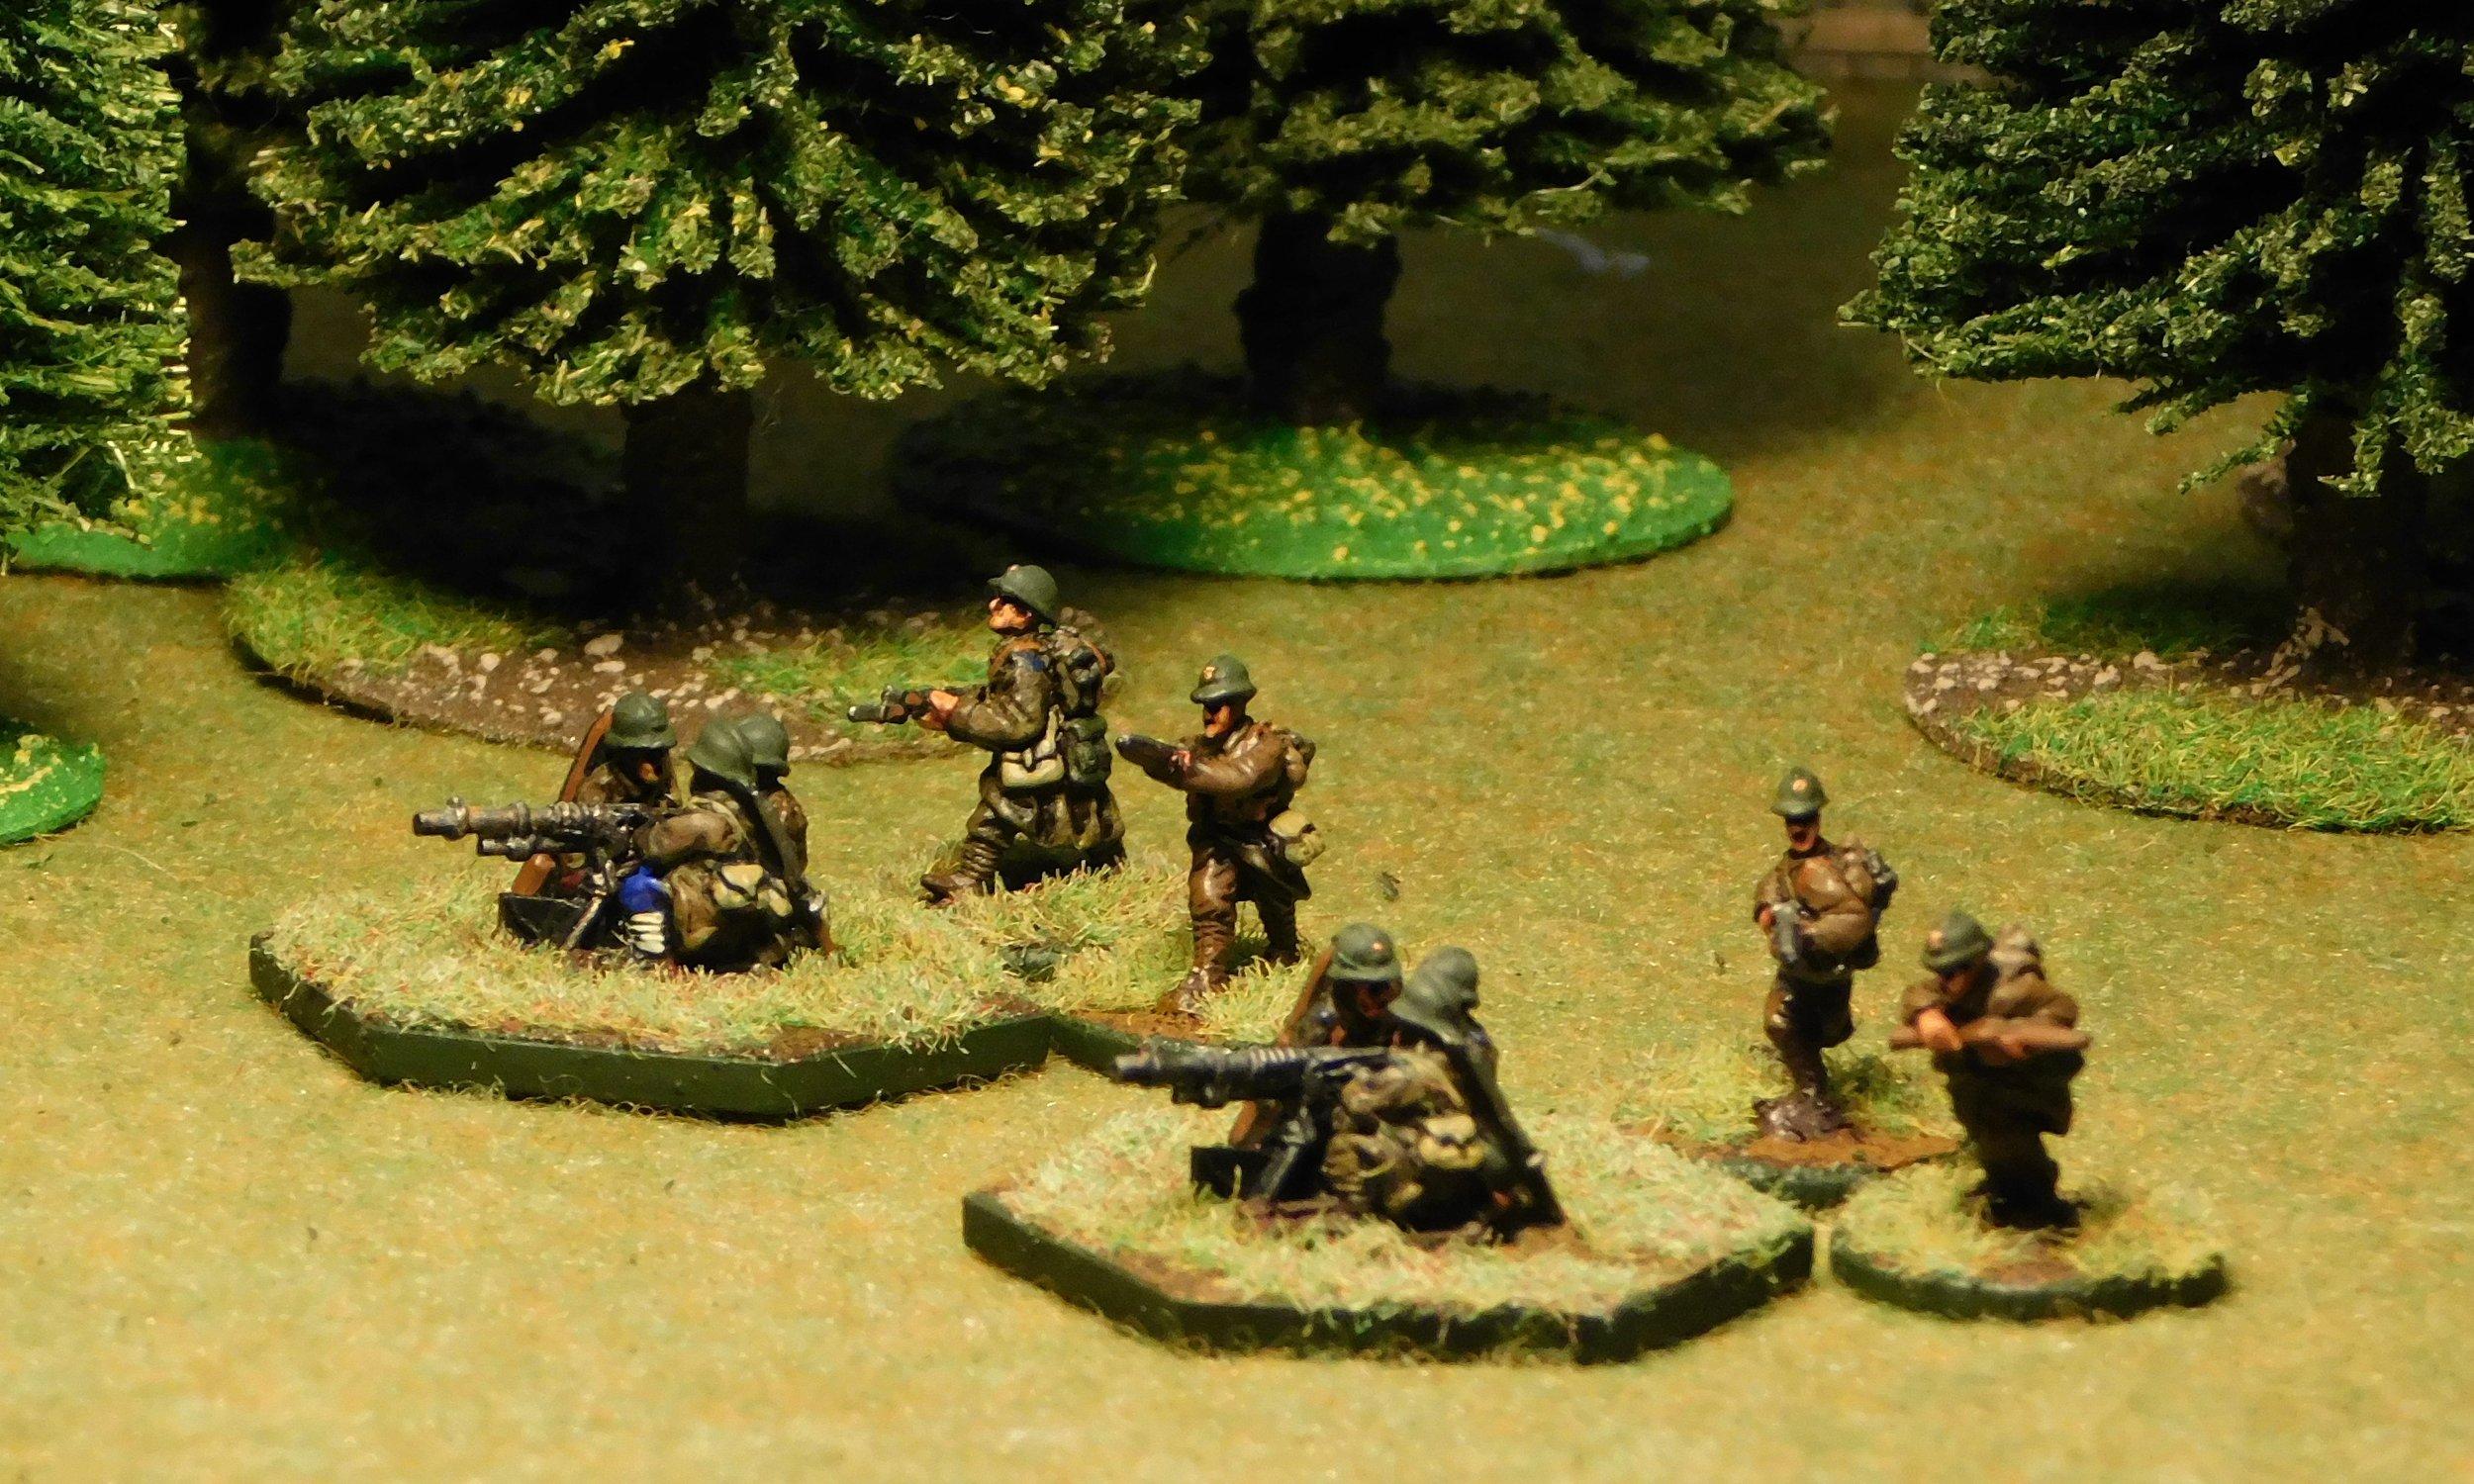 1st MMG Platoon (no transport)